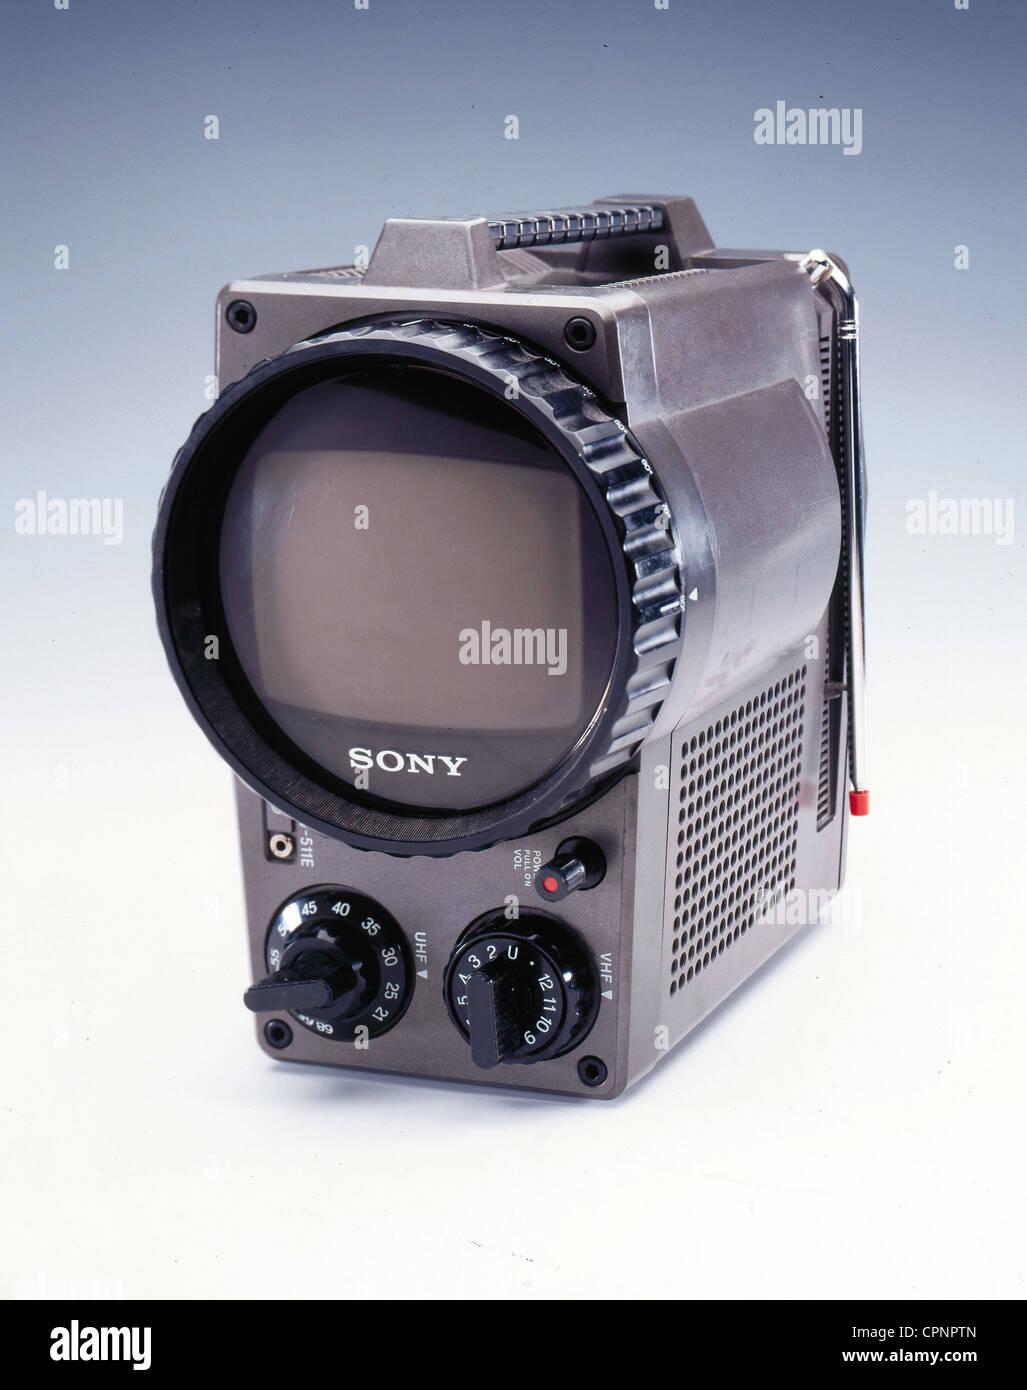 Transistor Television Set Stock Photos Simple Intercom Using Tree Transistors Broadcast Portable Sony Tv 511 E With In